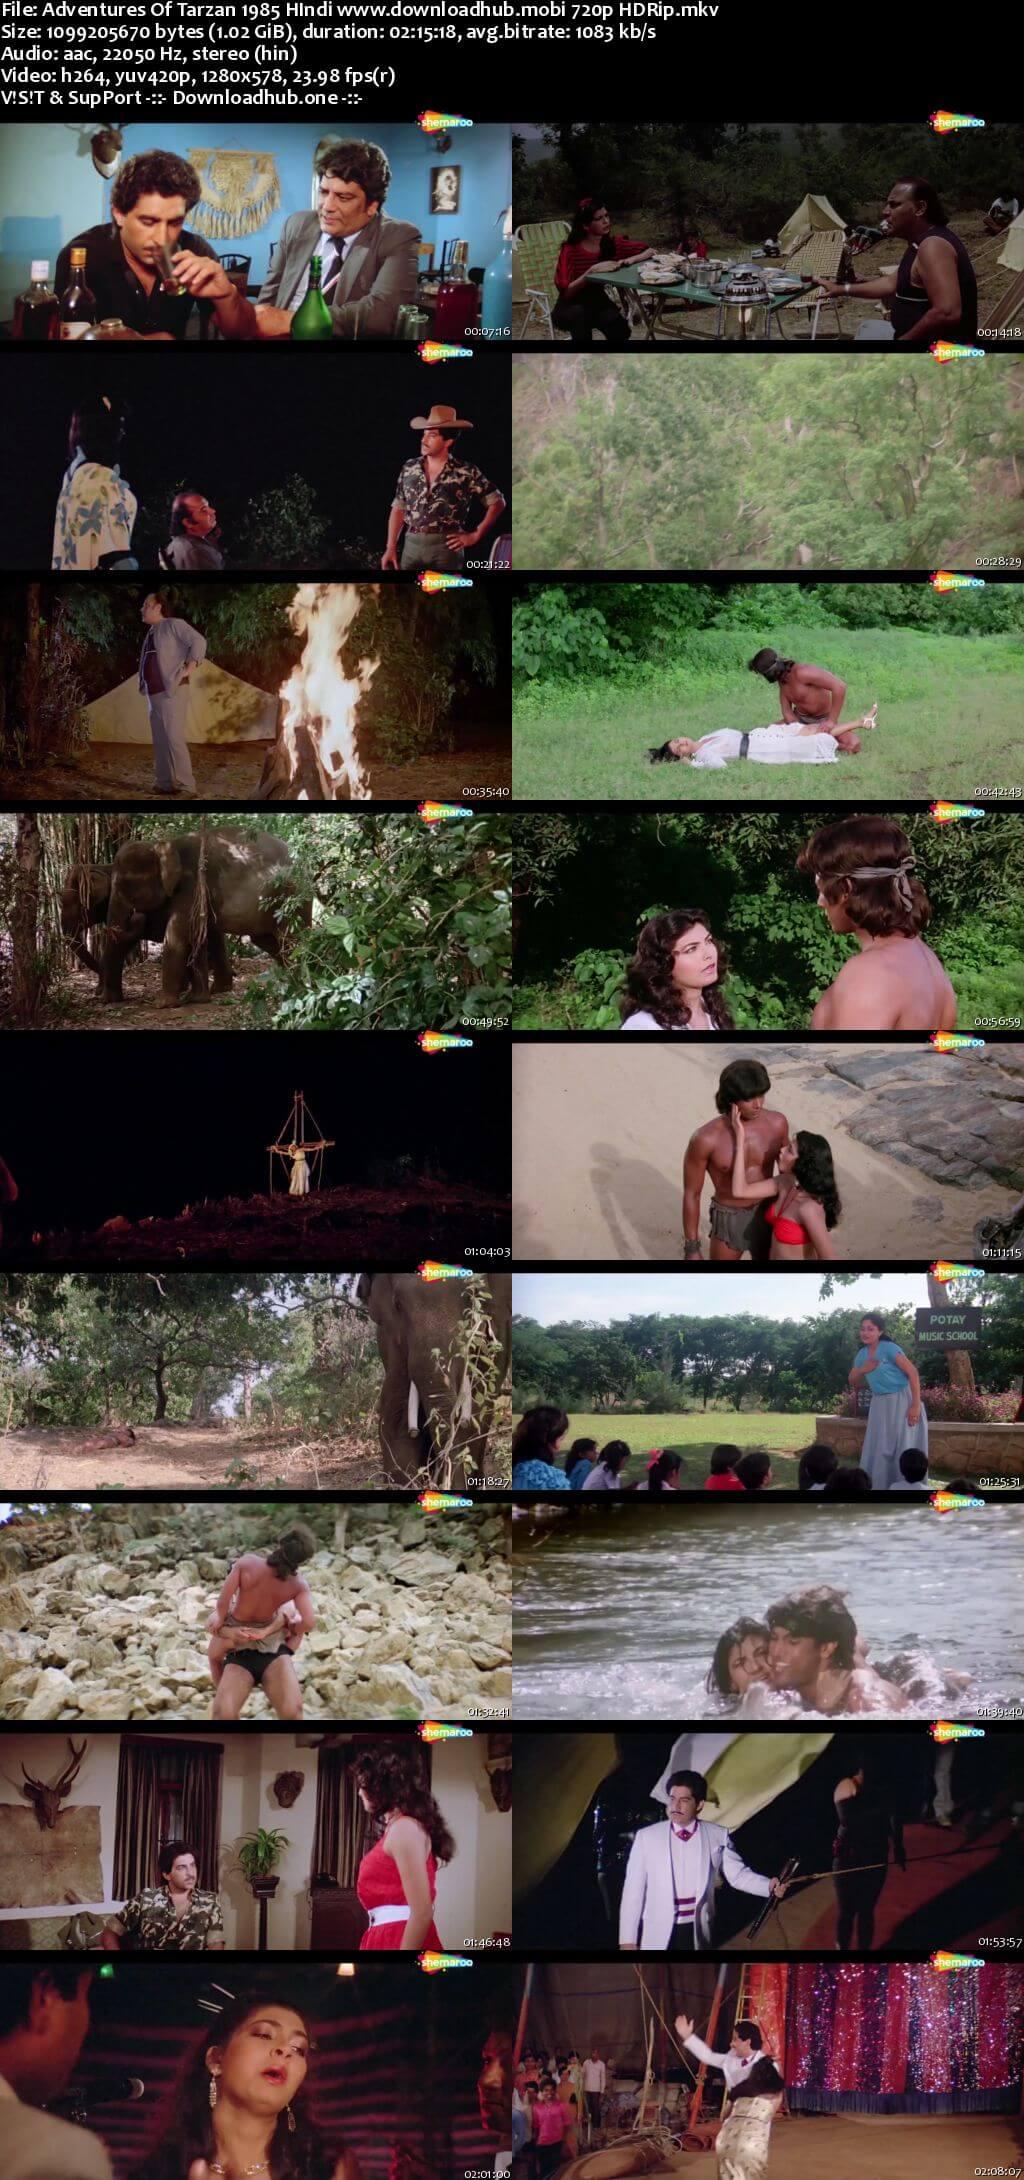 Adventures of Tarzan 1985 Hindi 720p HDRip x264